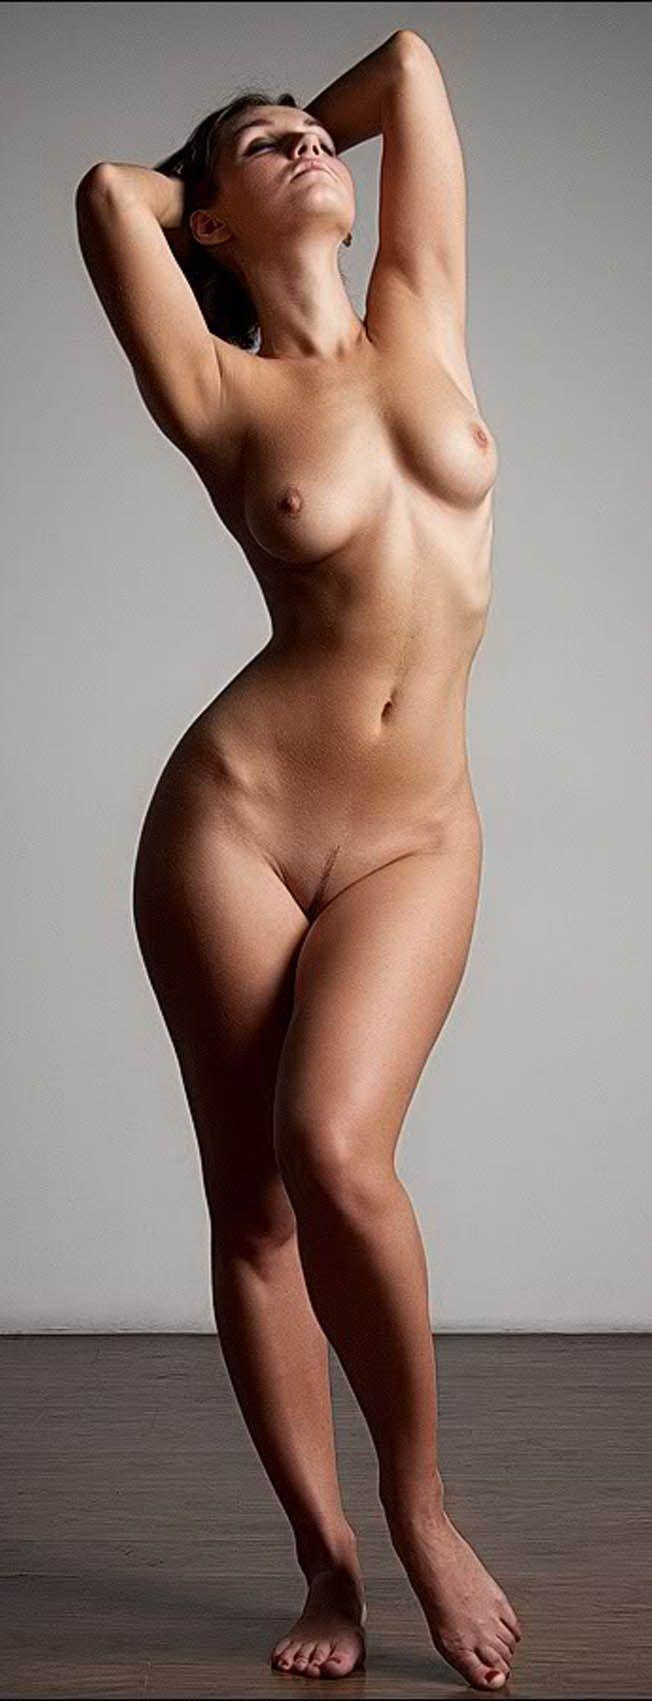 Cute japanese girls nude sex gif